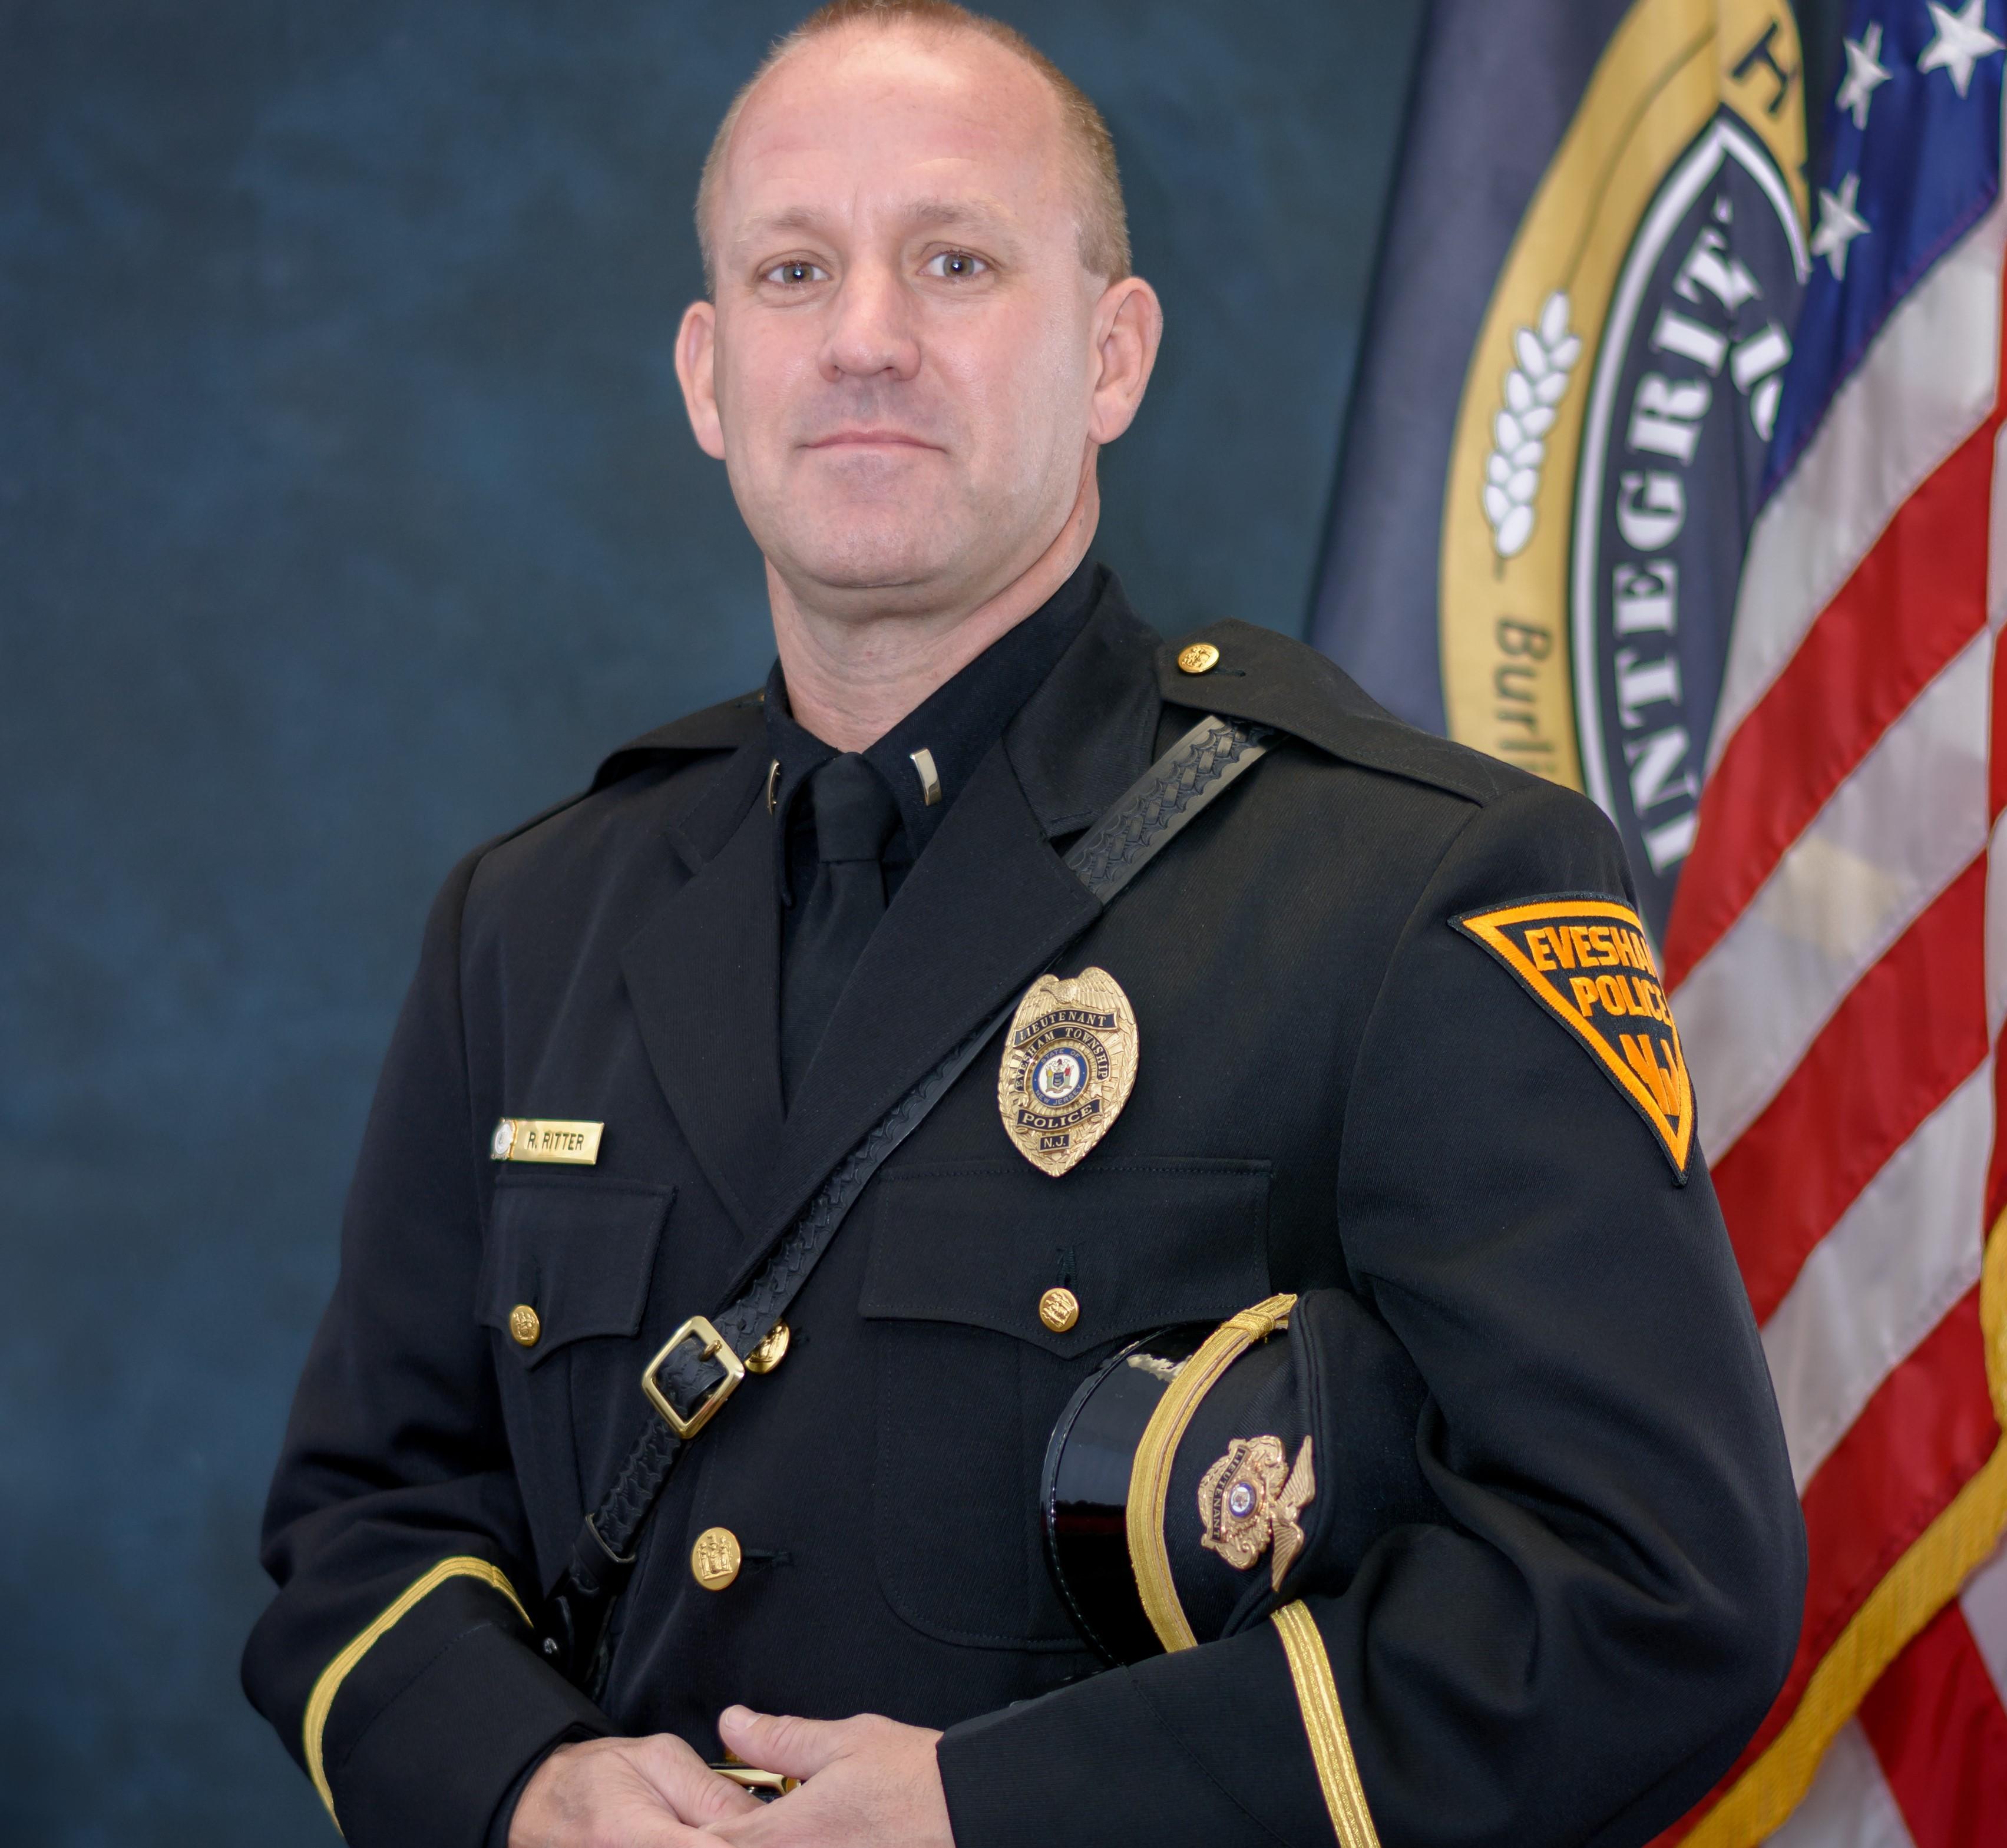 Support Services Bureau Commander - Lieutenant Ronald Ritter